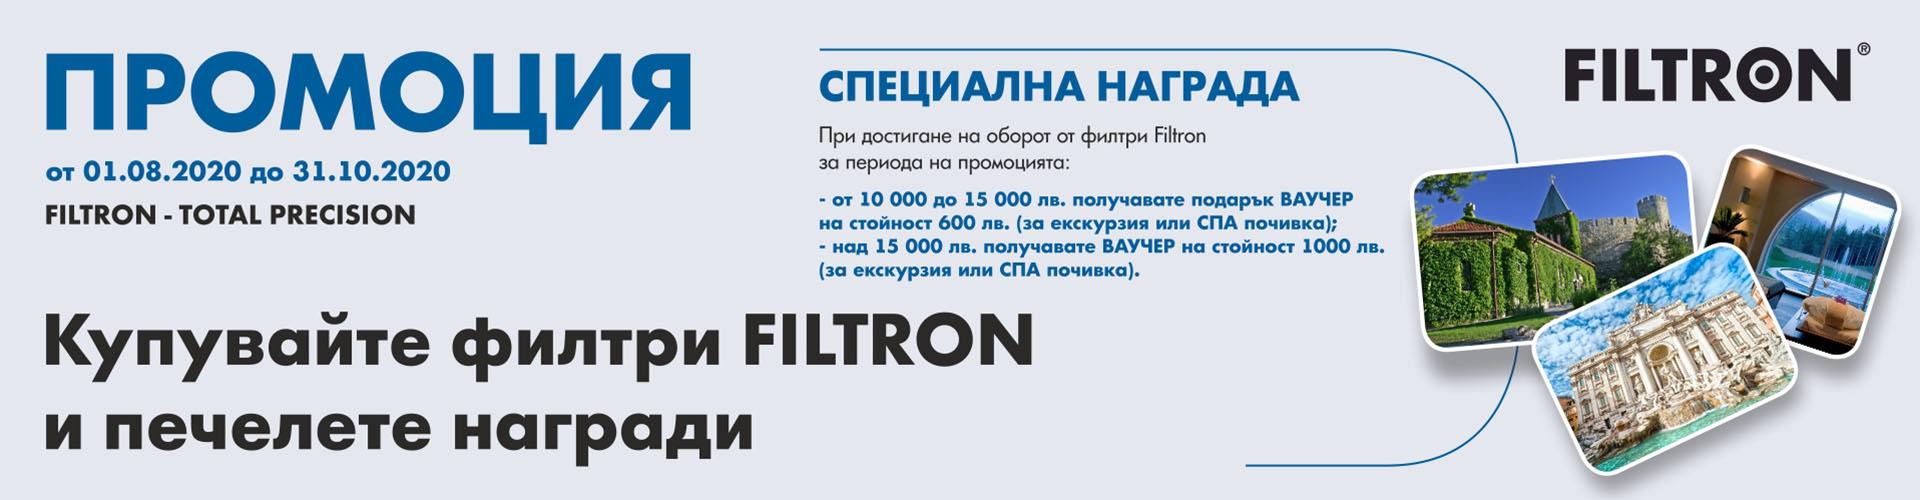 promo_filtron_01.08.2020-31.10.2020_banner.jpg